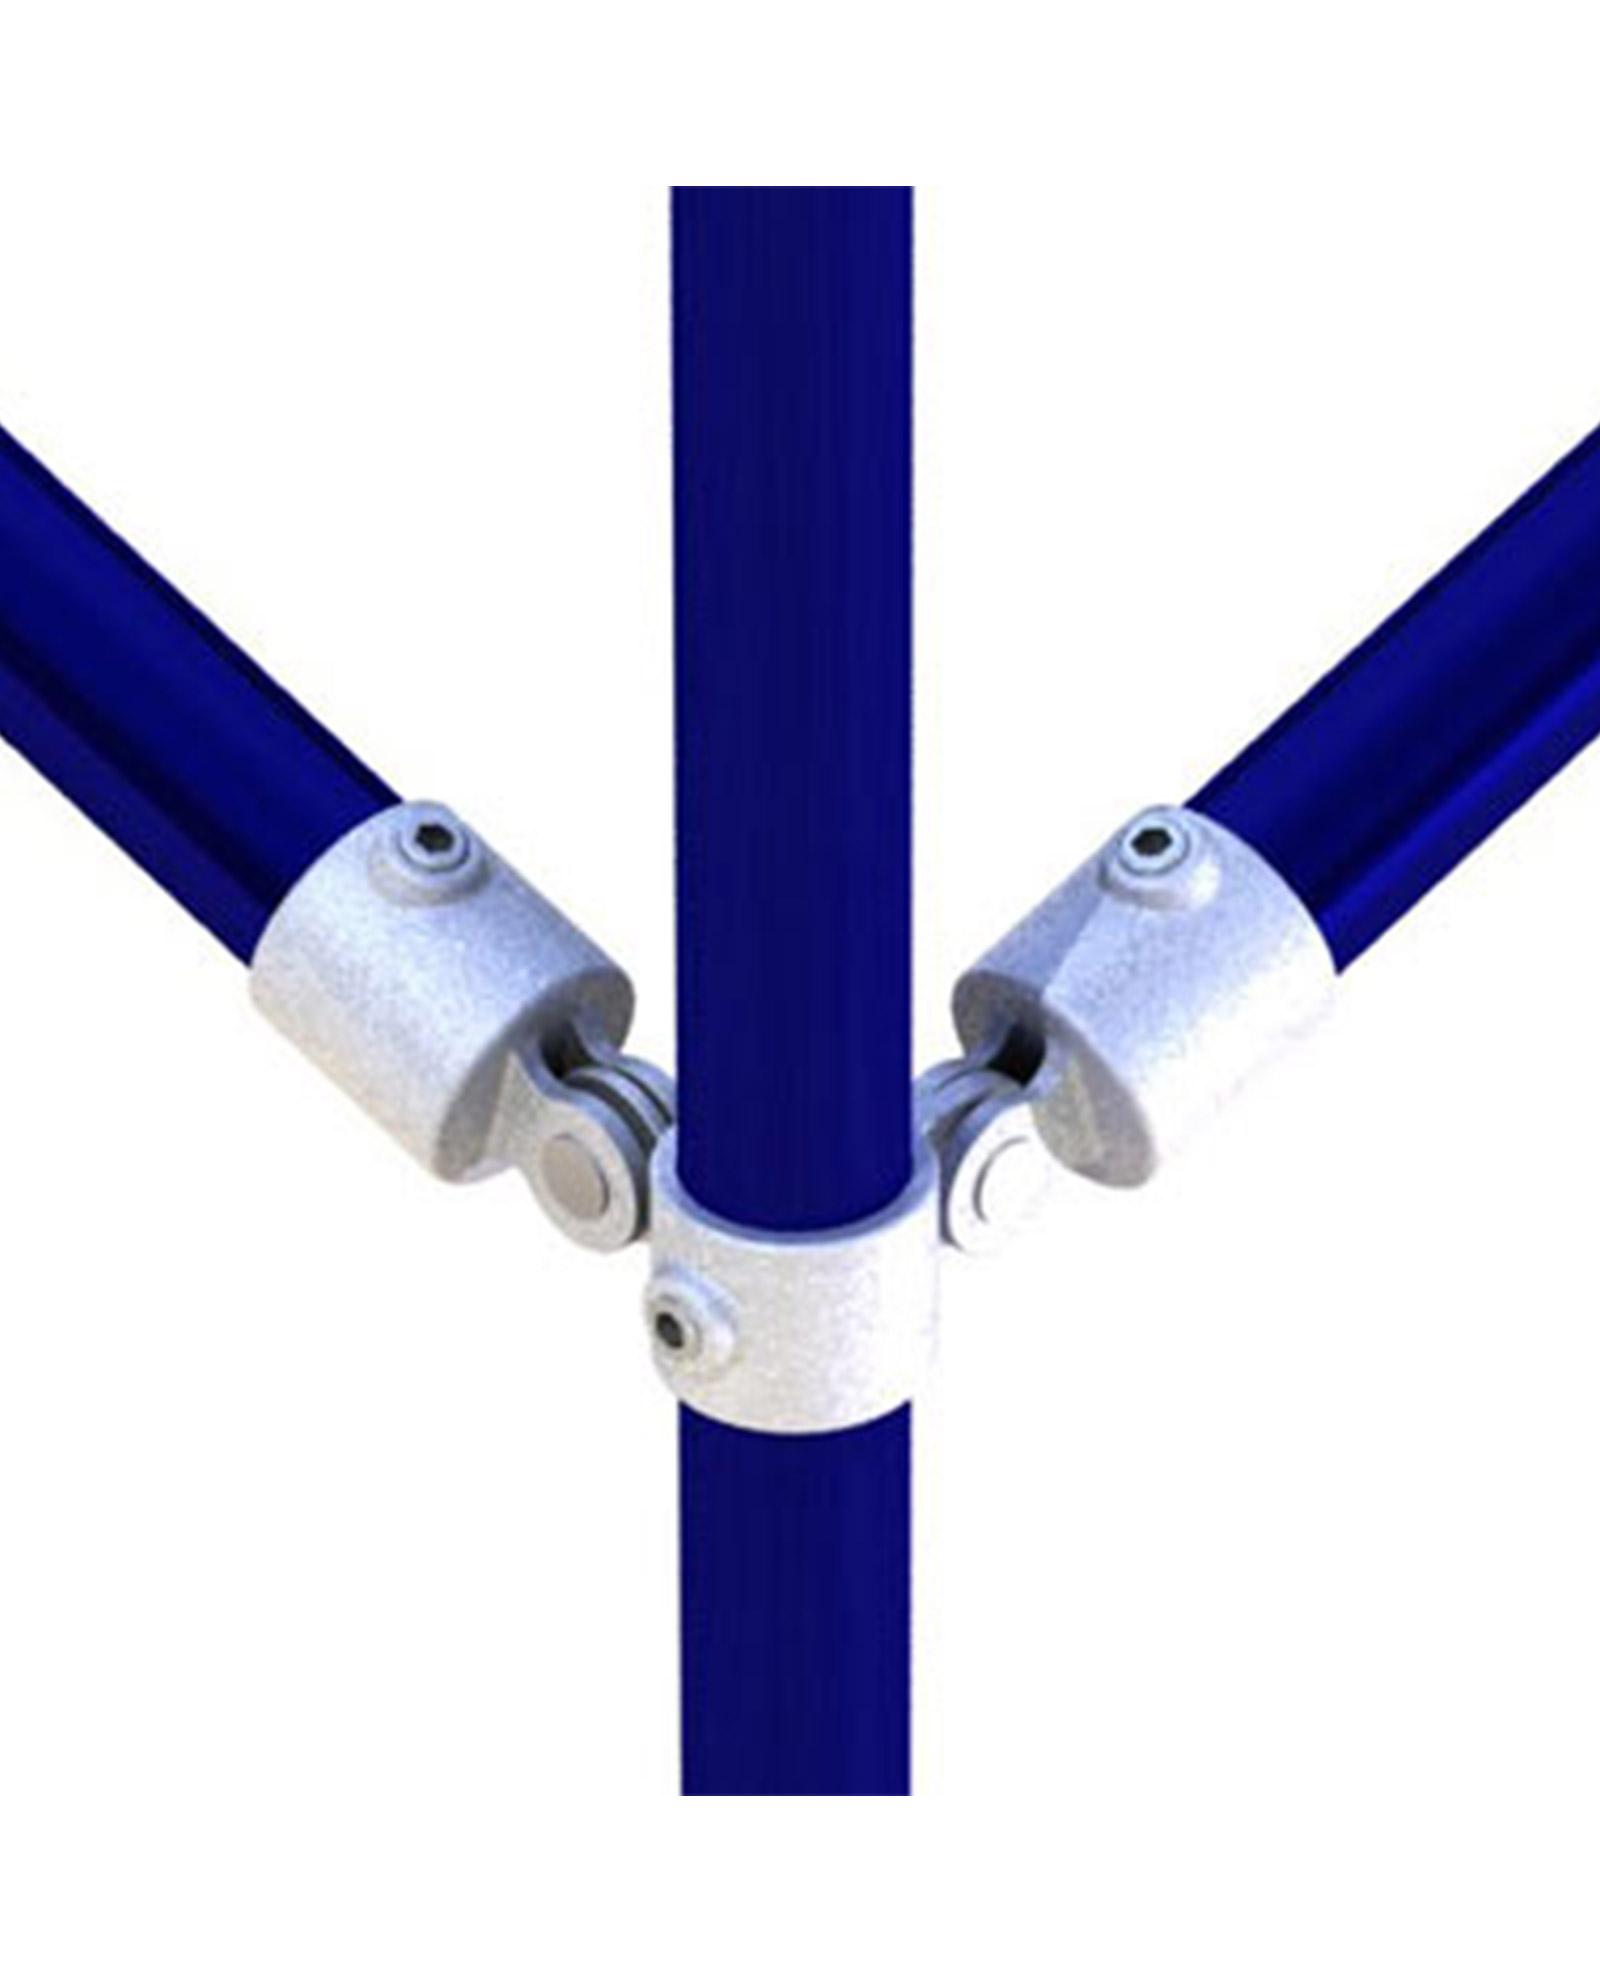 Doughtypipeclamp 90 Degree Corner Swivel Combination